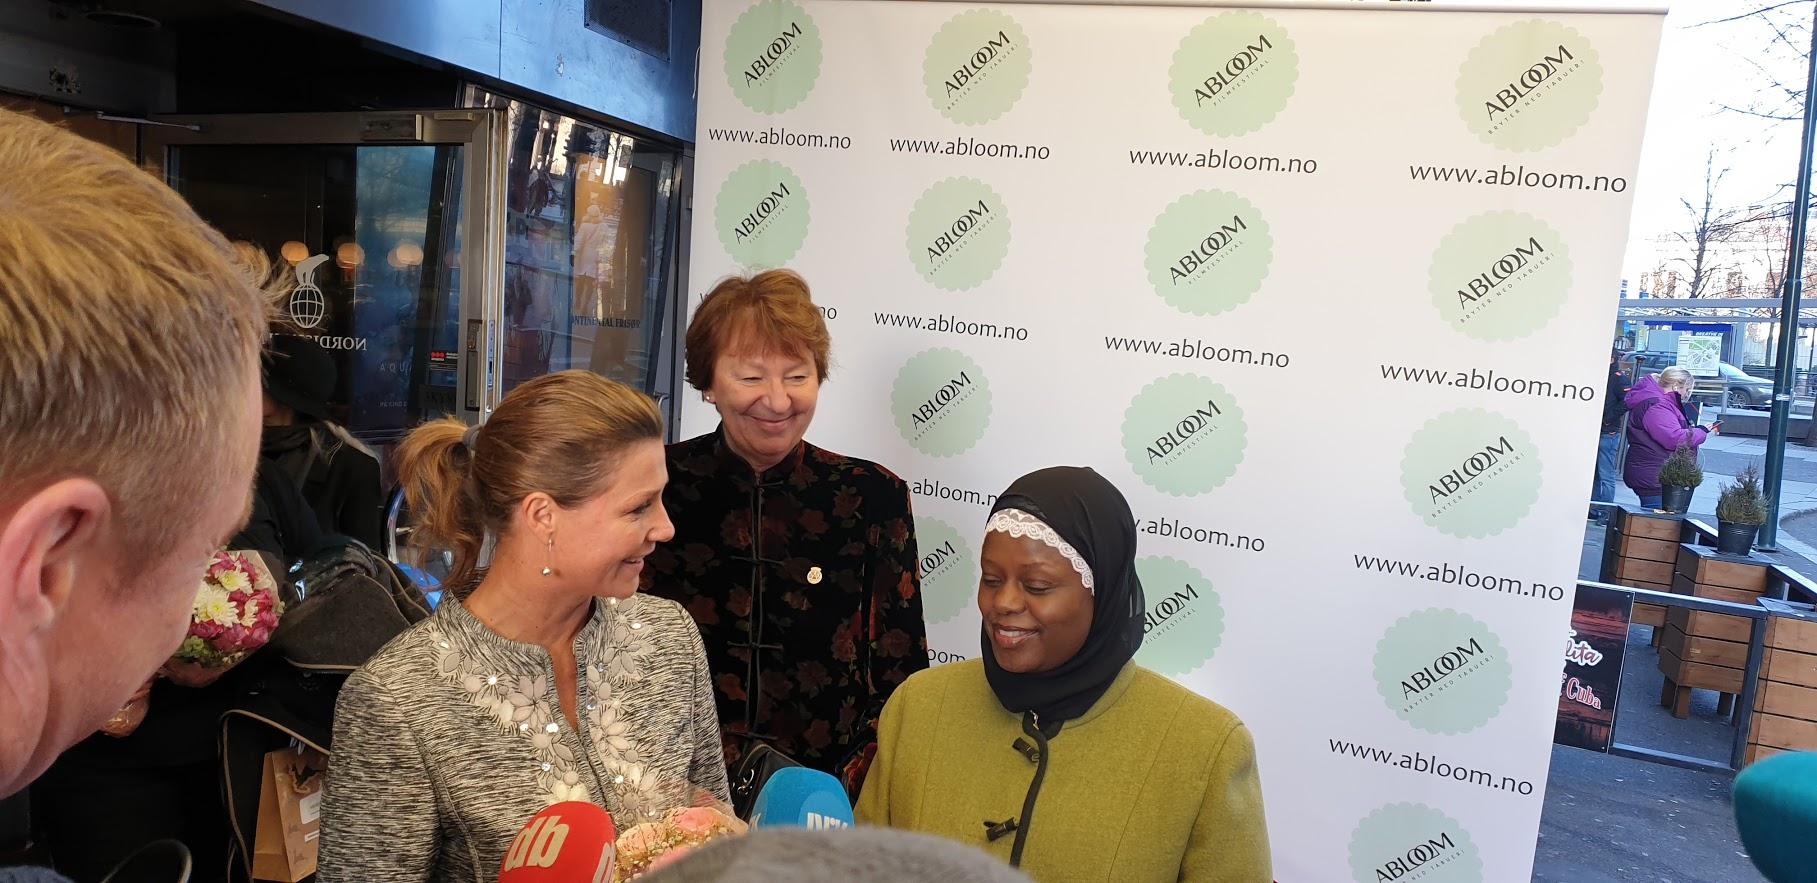 Abloom-leder Faridah tok imot Prinsesse Märtha Louise og ordfører Marianne Borgen (SV). Foto: Bjørn Lecomte